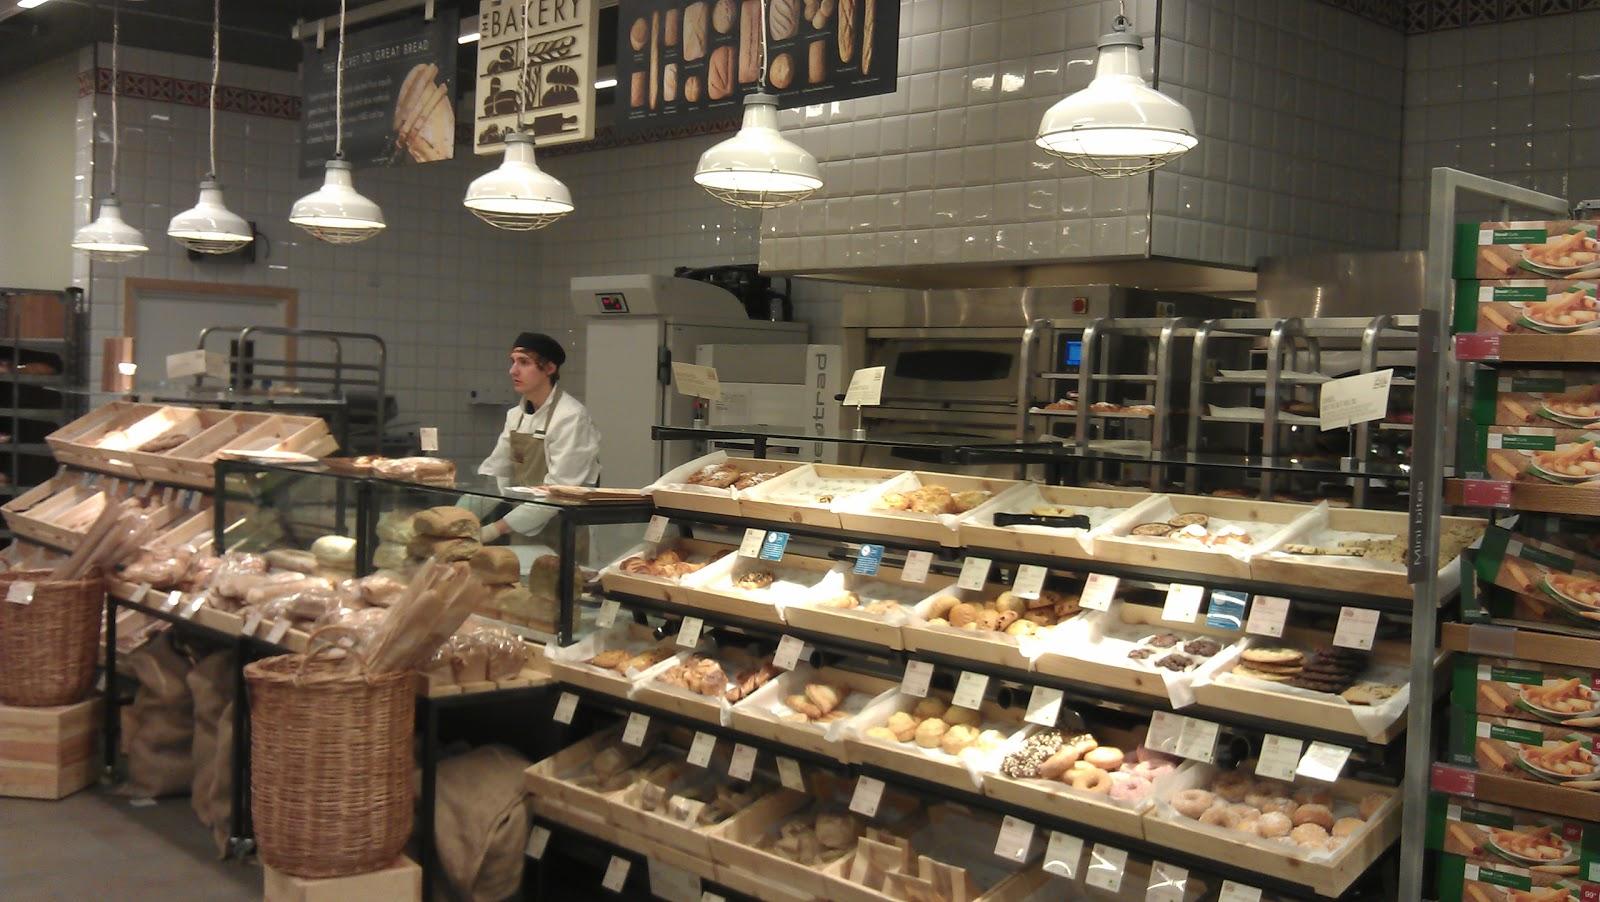 Great Cafes: Supermarket Bakeries